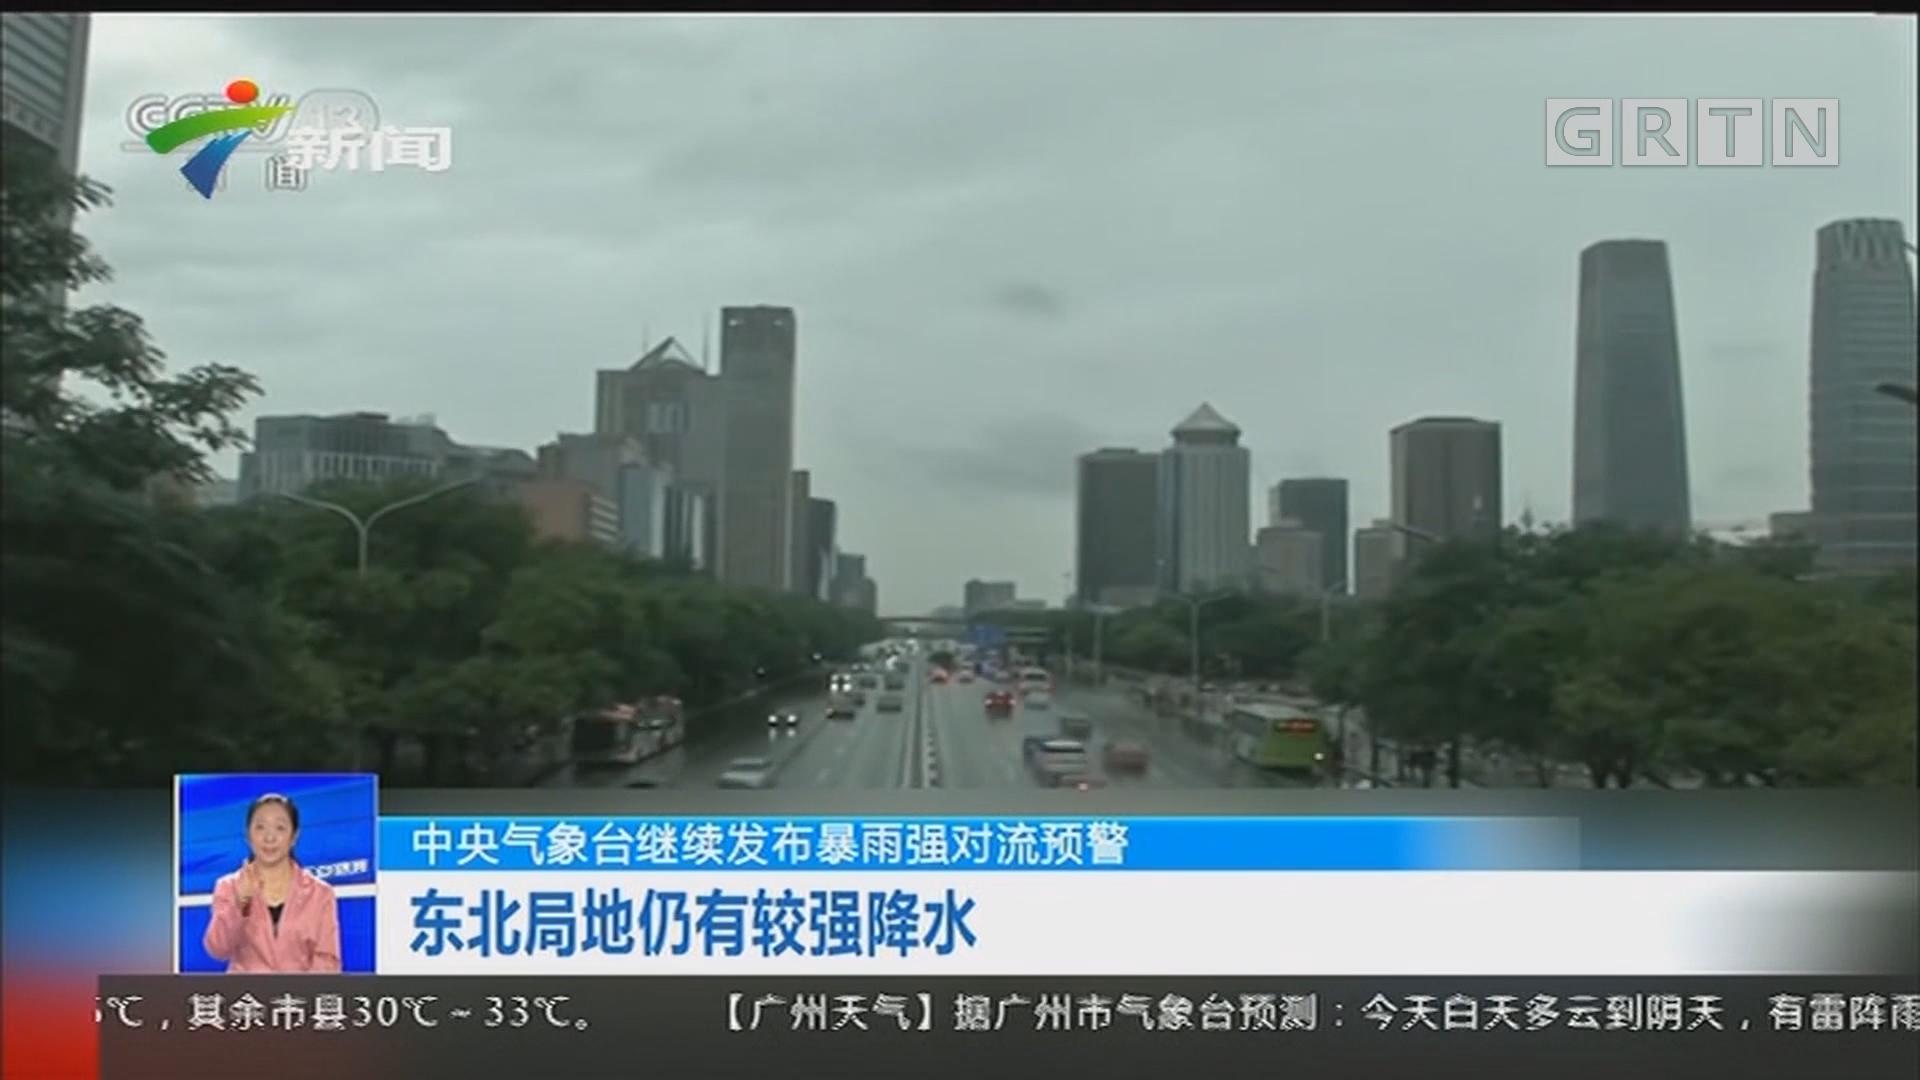 [HD][2019-07-30]正点播报:中央气象台继续发布暴雨强对流预警 东北局地仍有较强降水